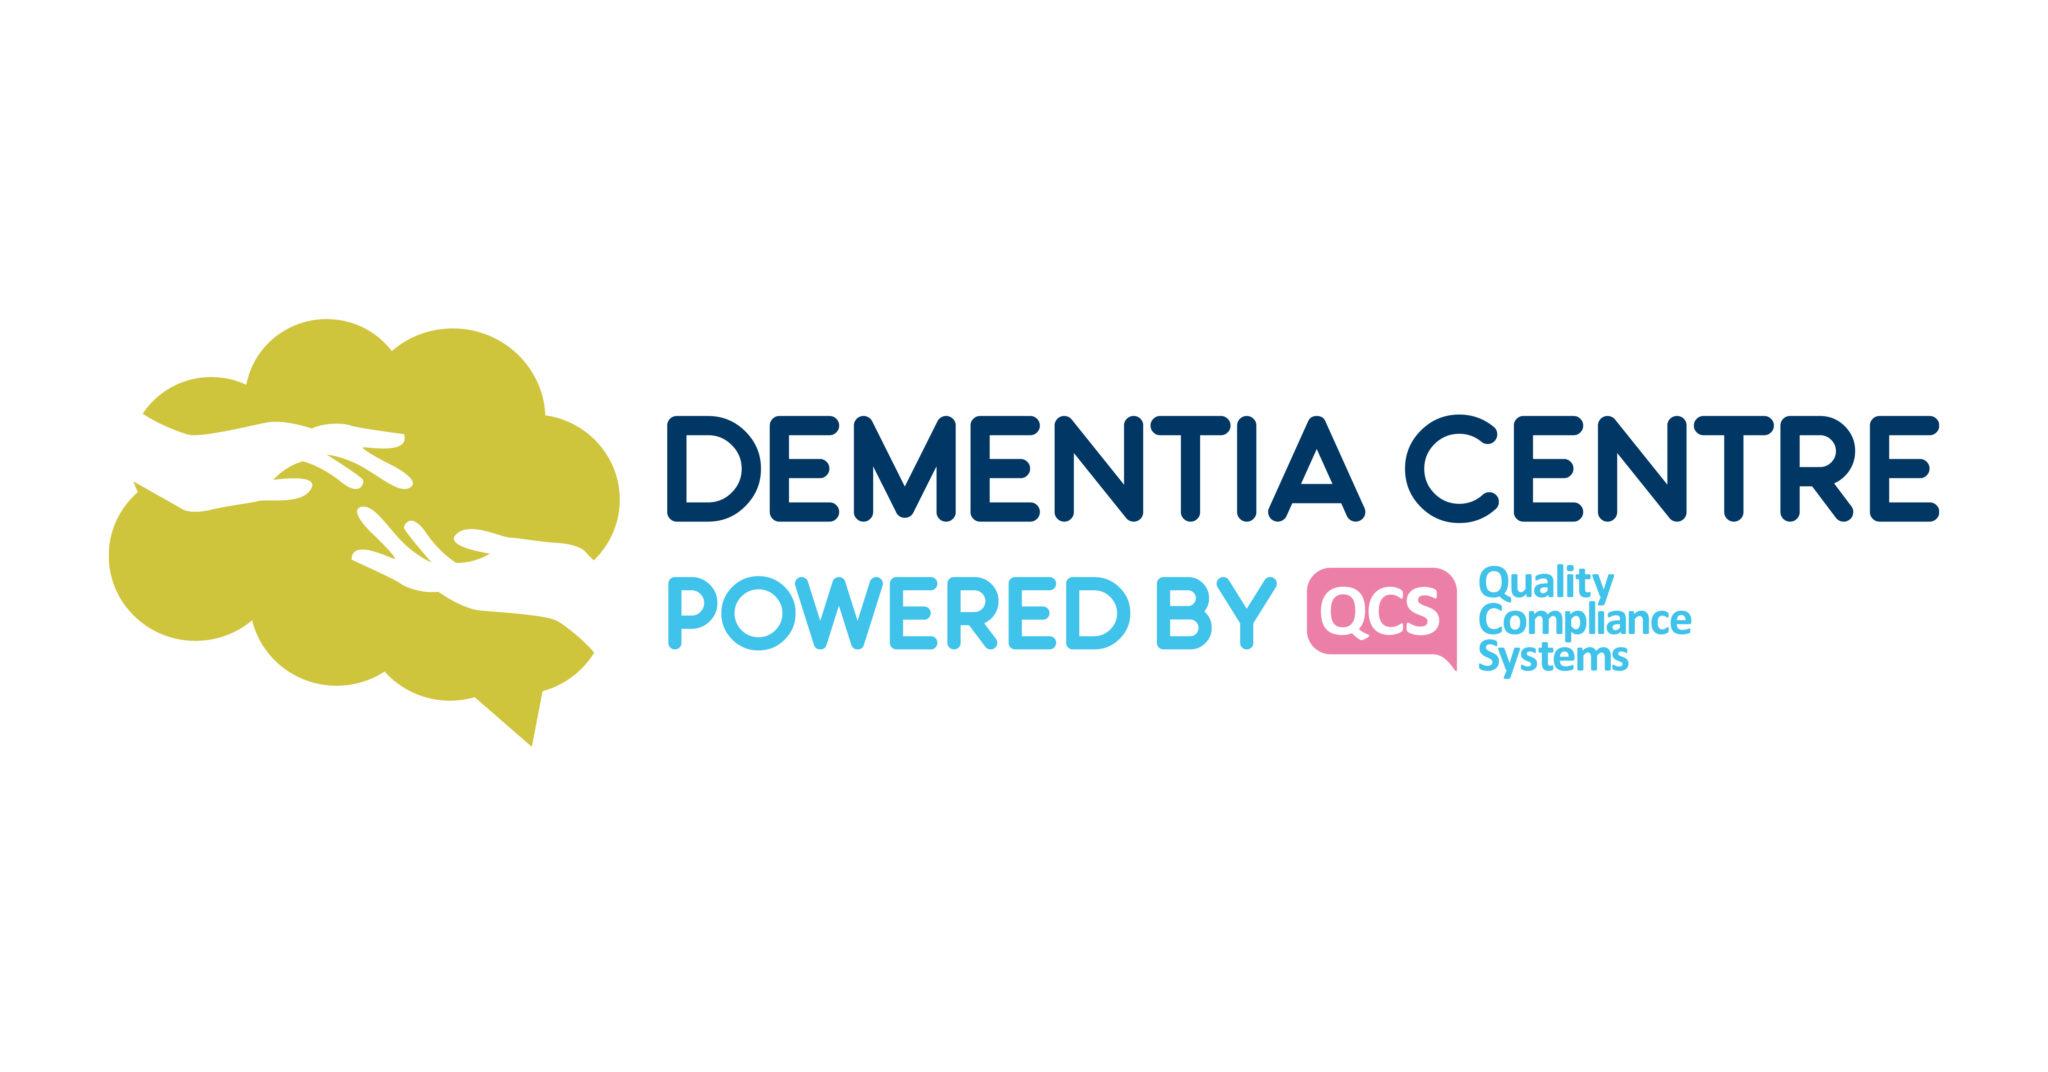 Dementia Centre logo